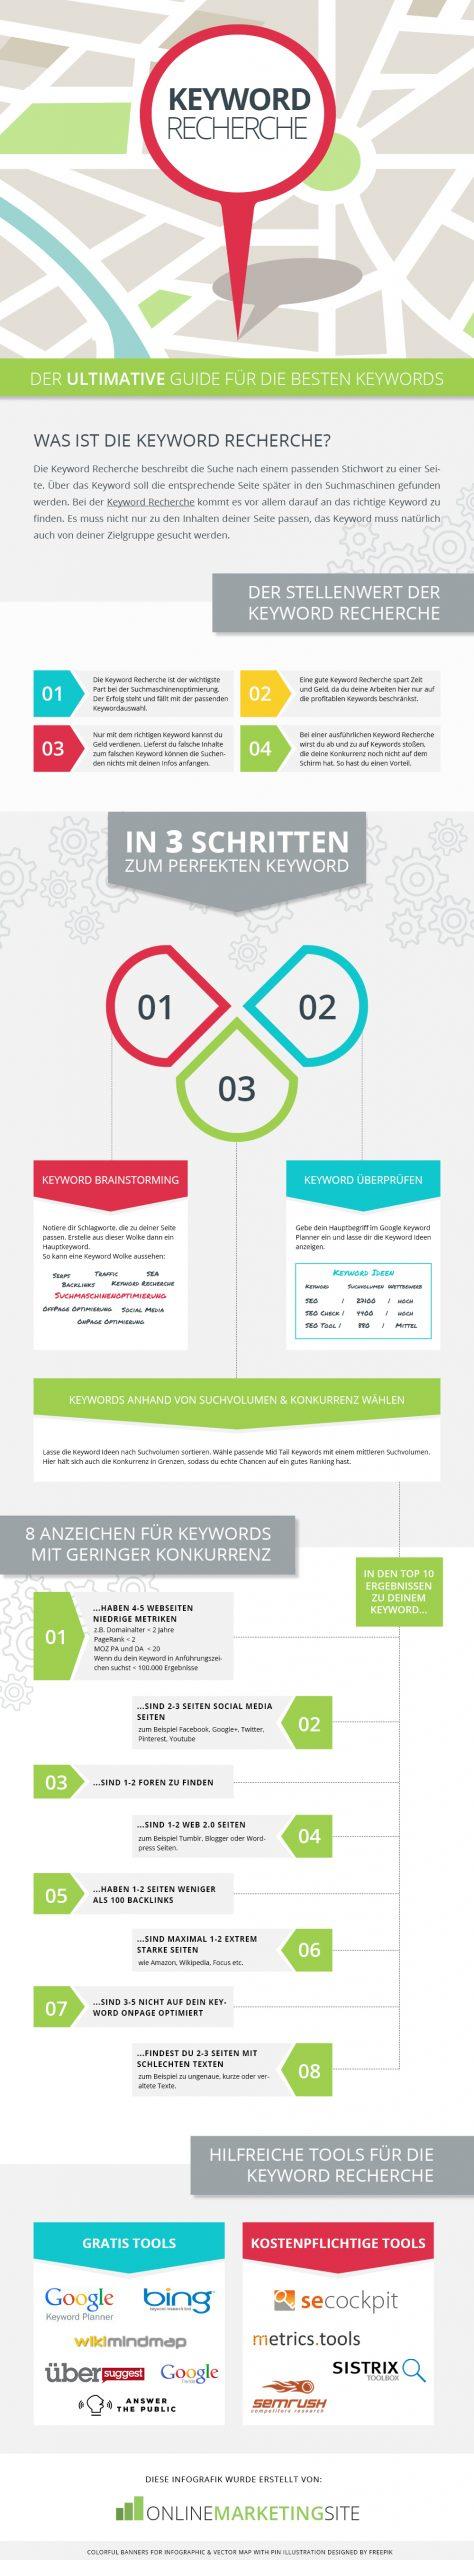 Keyword Recherche - Die Infografik